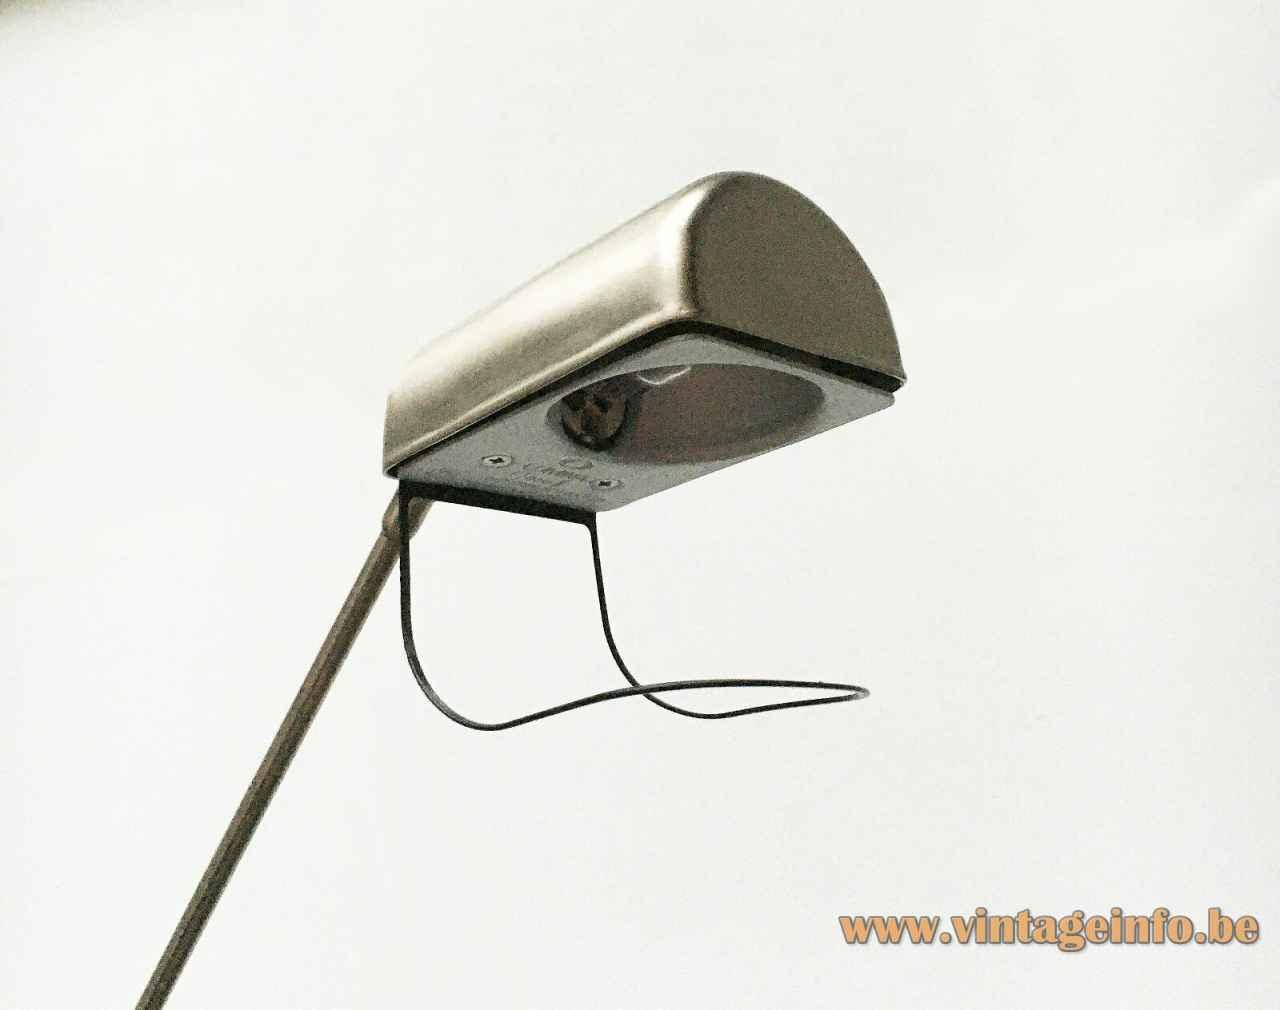 Lumina Daphine floor lamp half round metal lampshade & handle 1970s Italy design: Tommaso Cimini